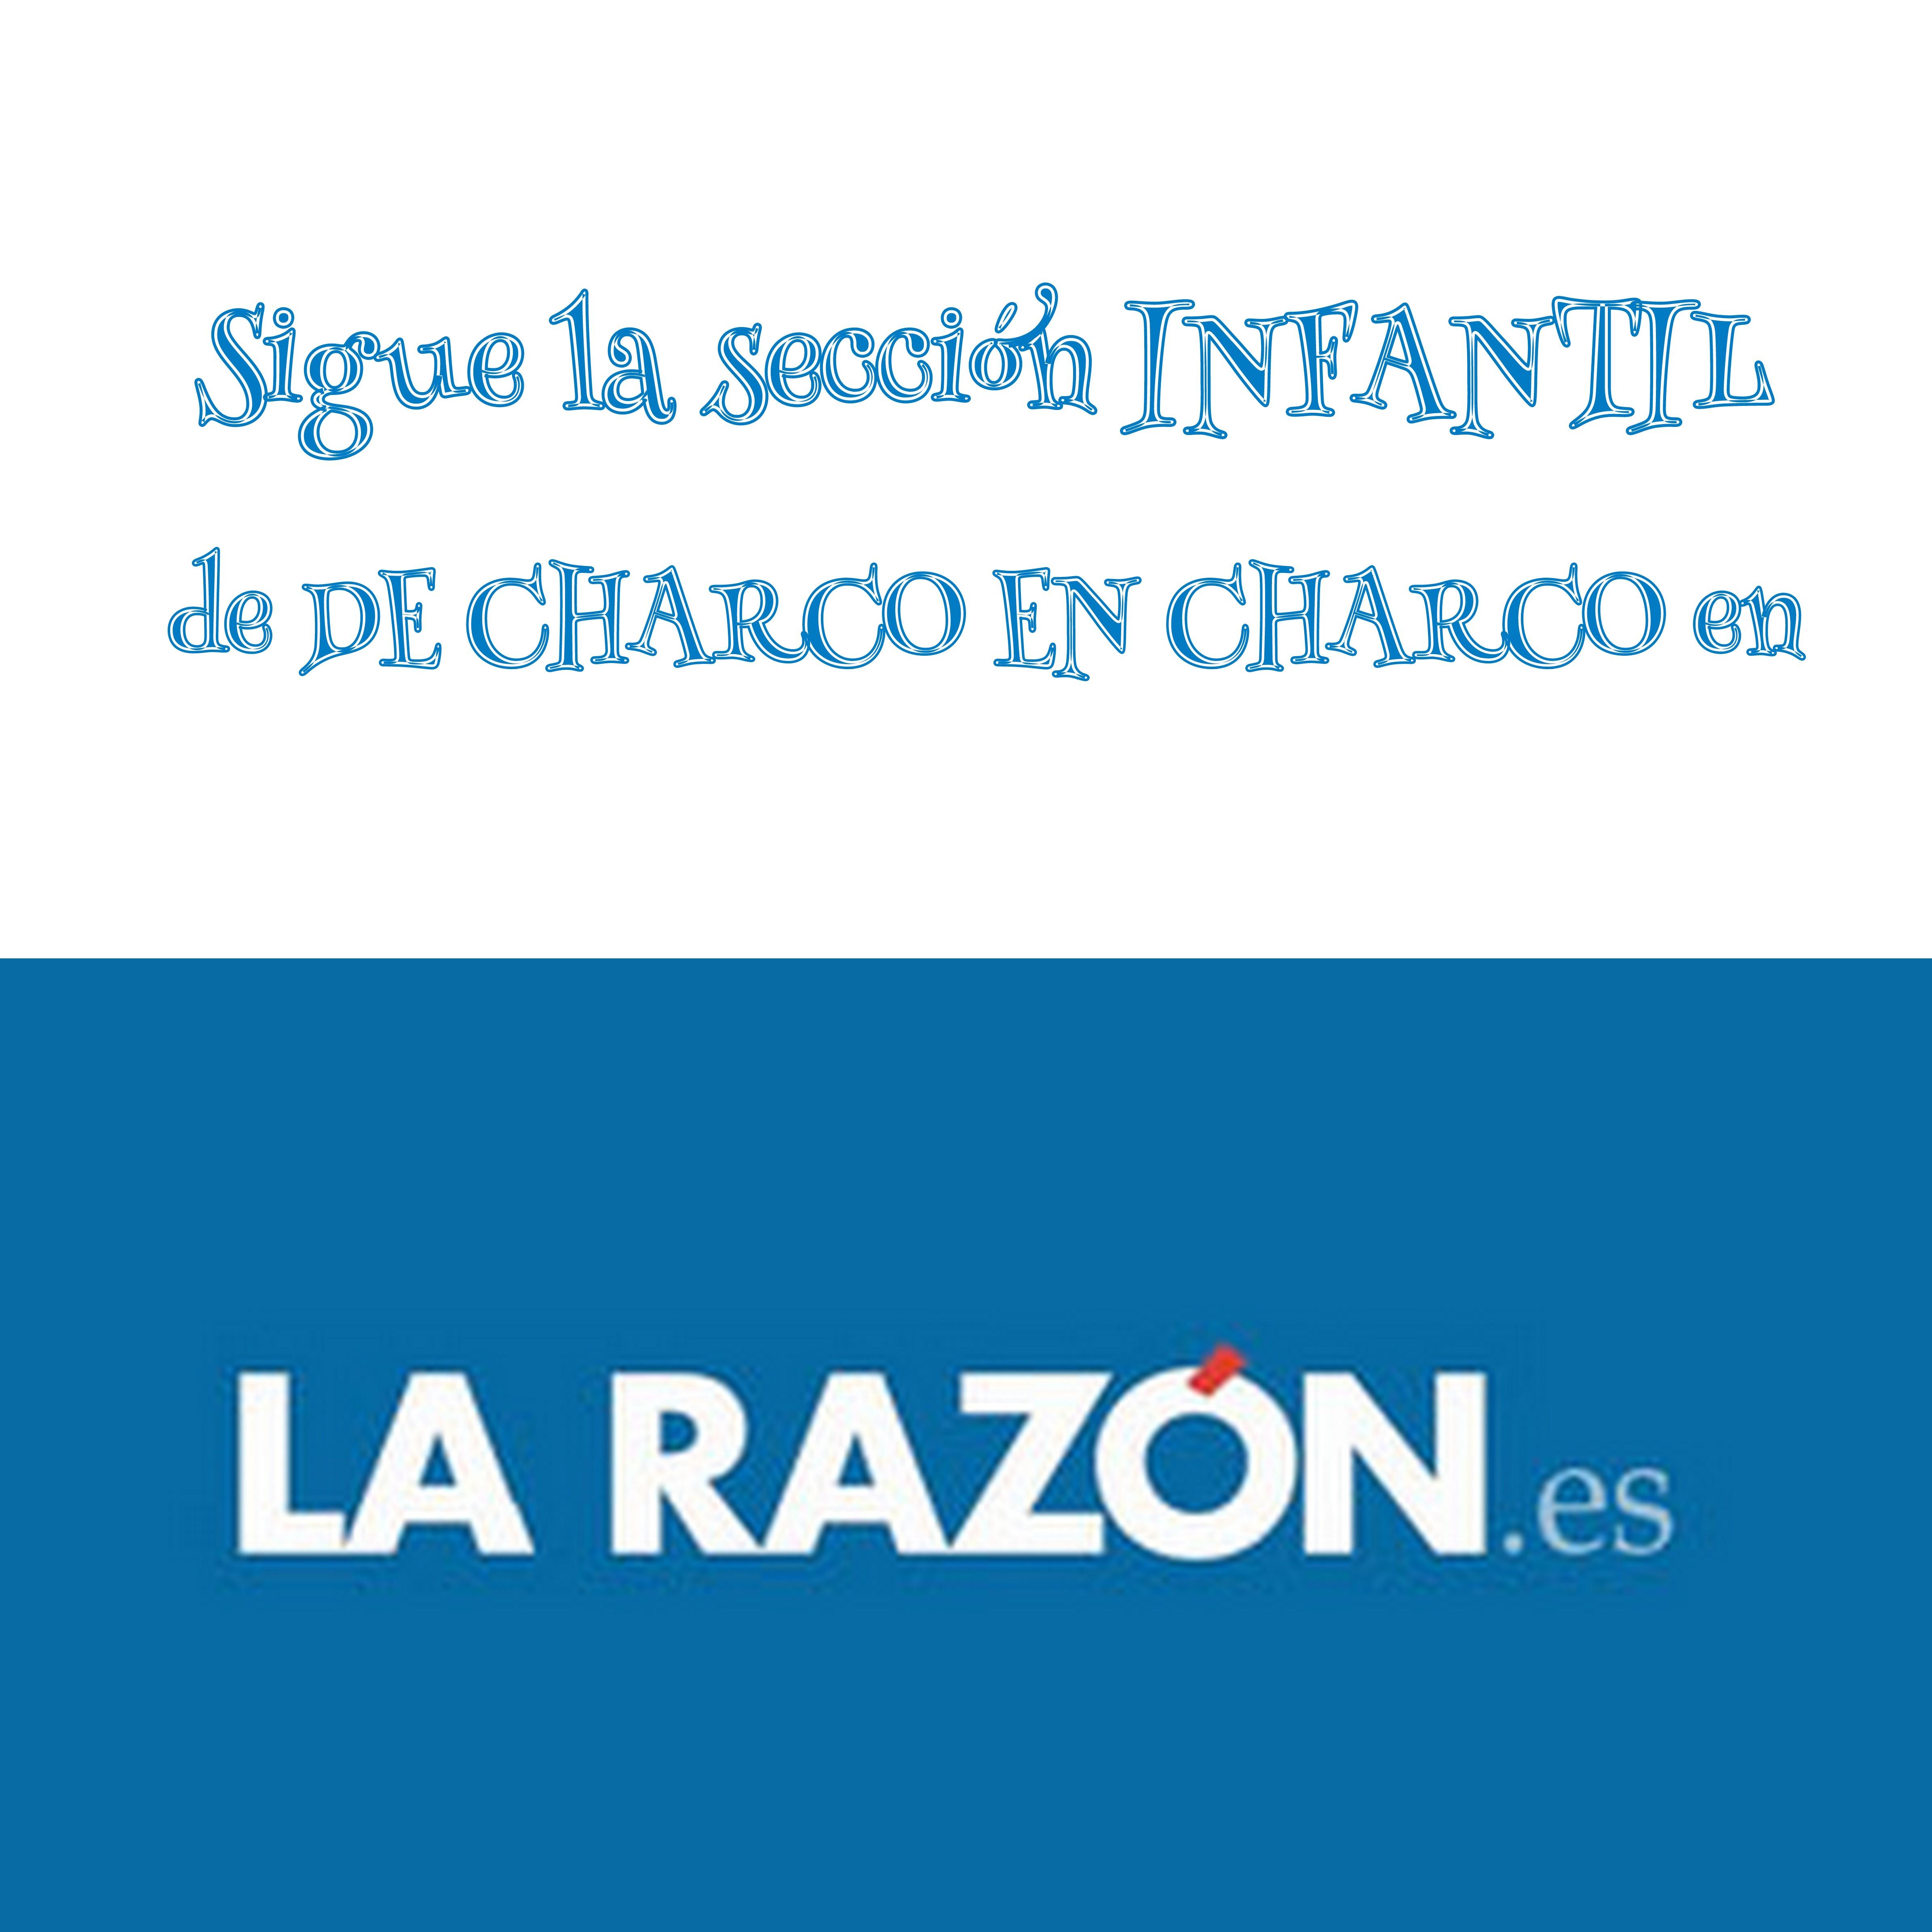 DE CHARCO EN CHARCO para LARAZON.es